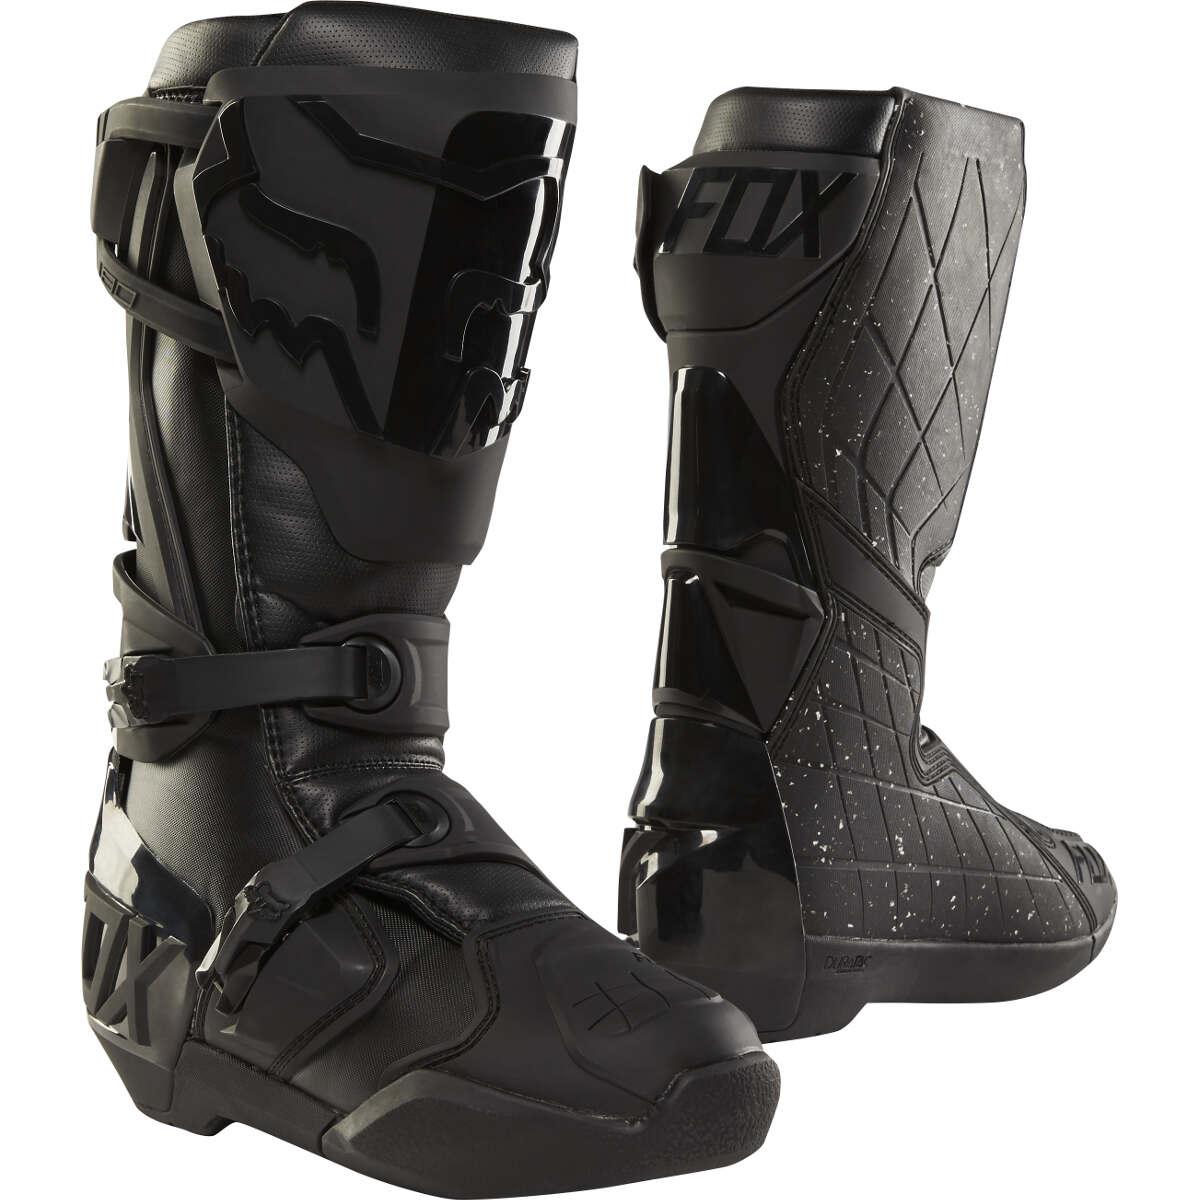 fox motocross stiefel 180 schwarz schwarz special edition san diego 2018 maciag offroad. Black Bedroom Furniture Sets. Home Design Ideas